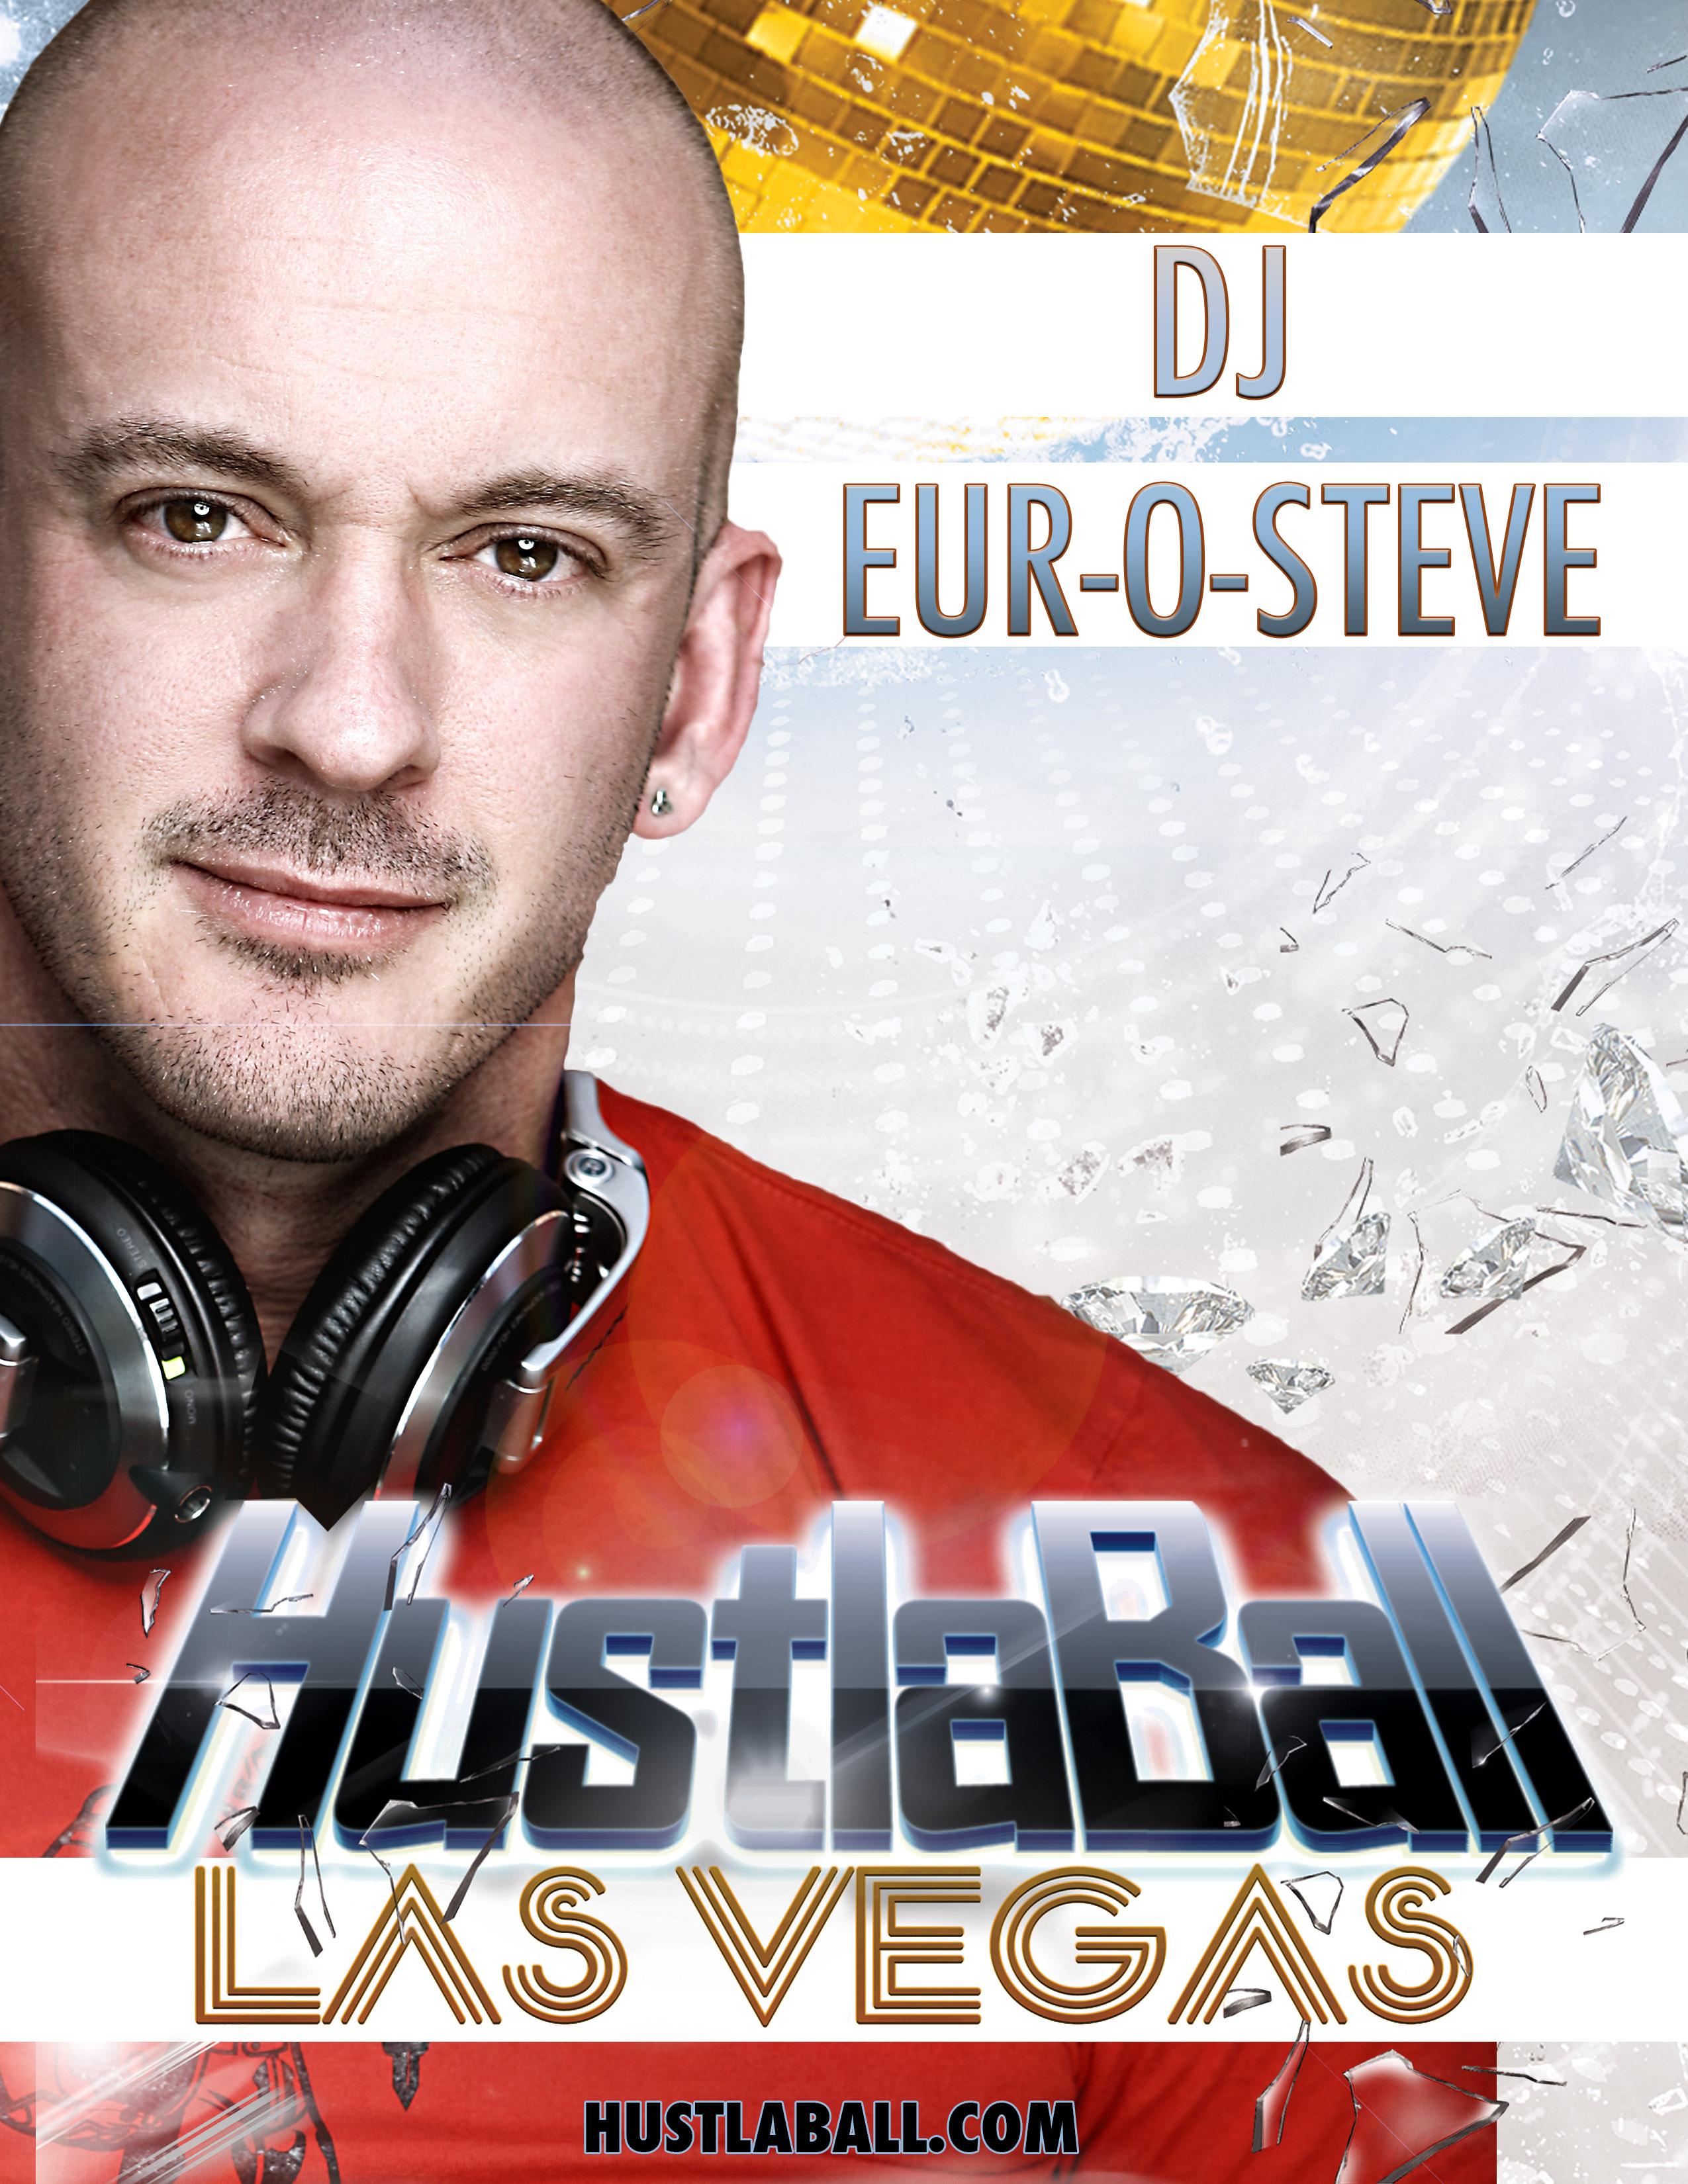 HustlaBall – Las Vegas